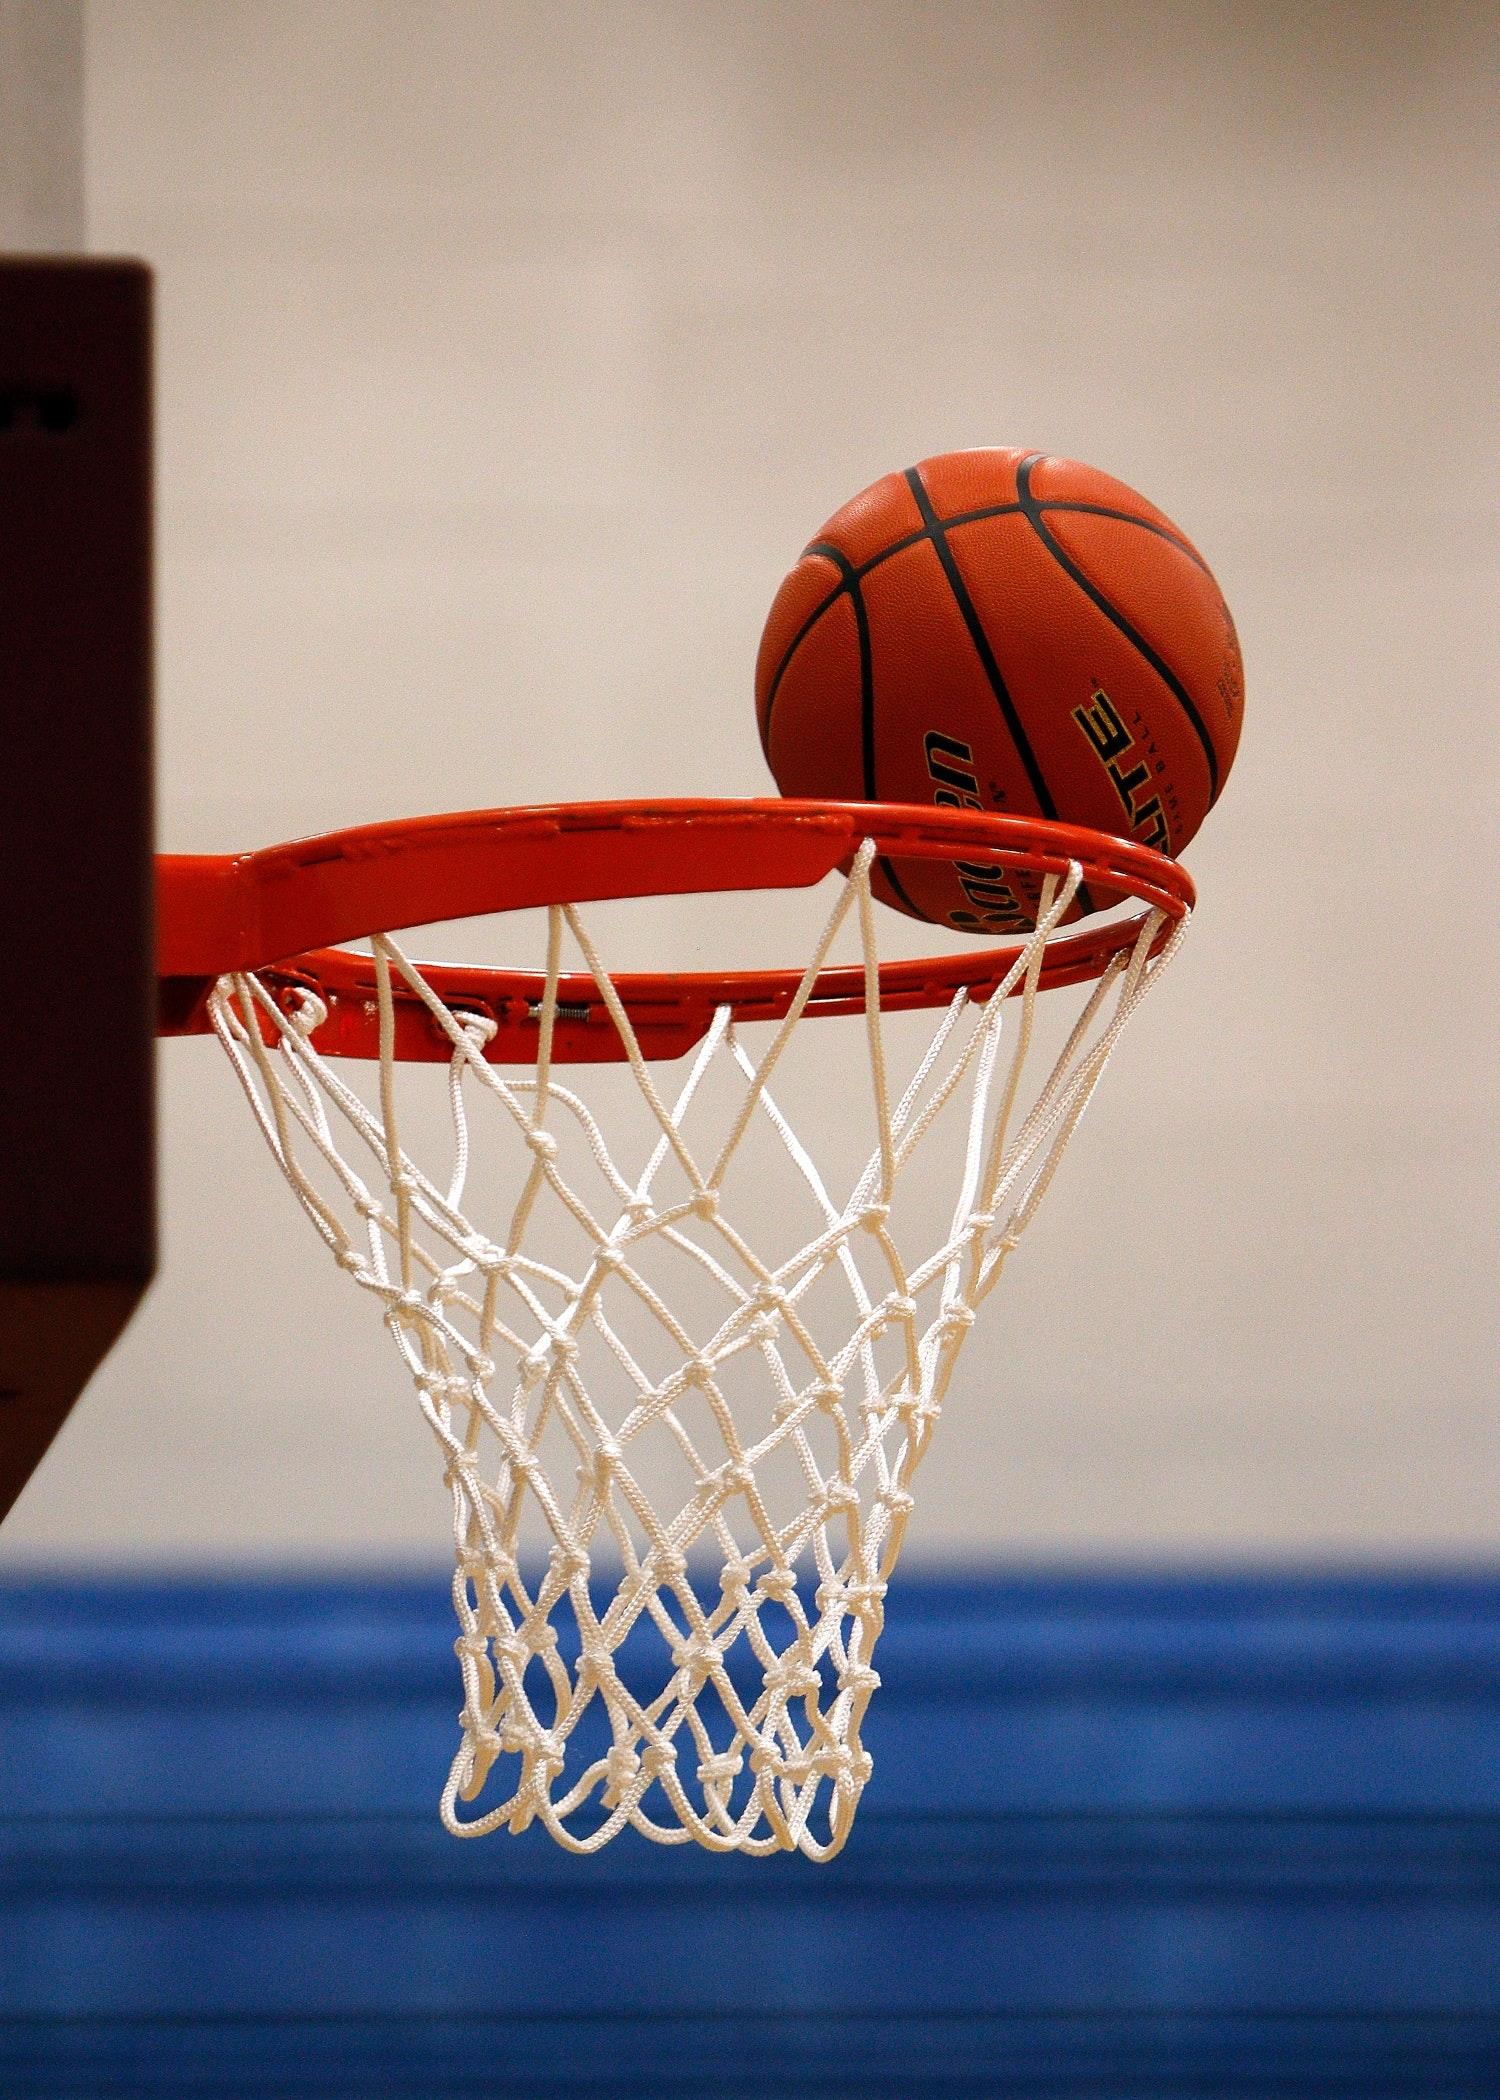 Symbolbild Turnhalle (Basketballkorb)